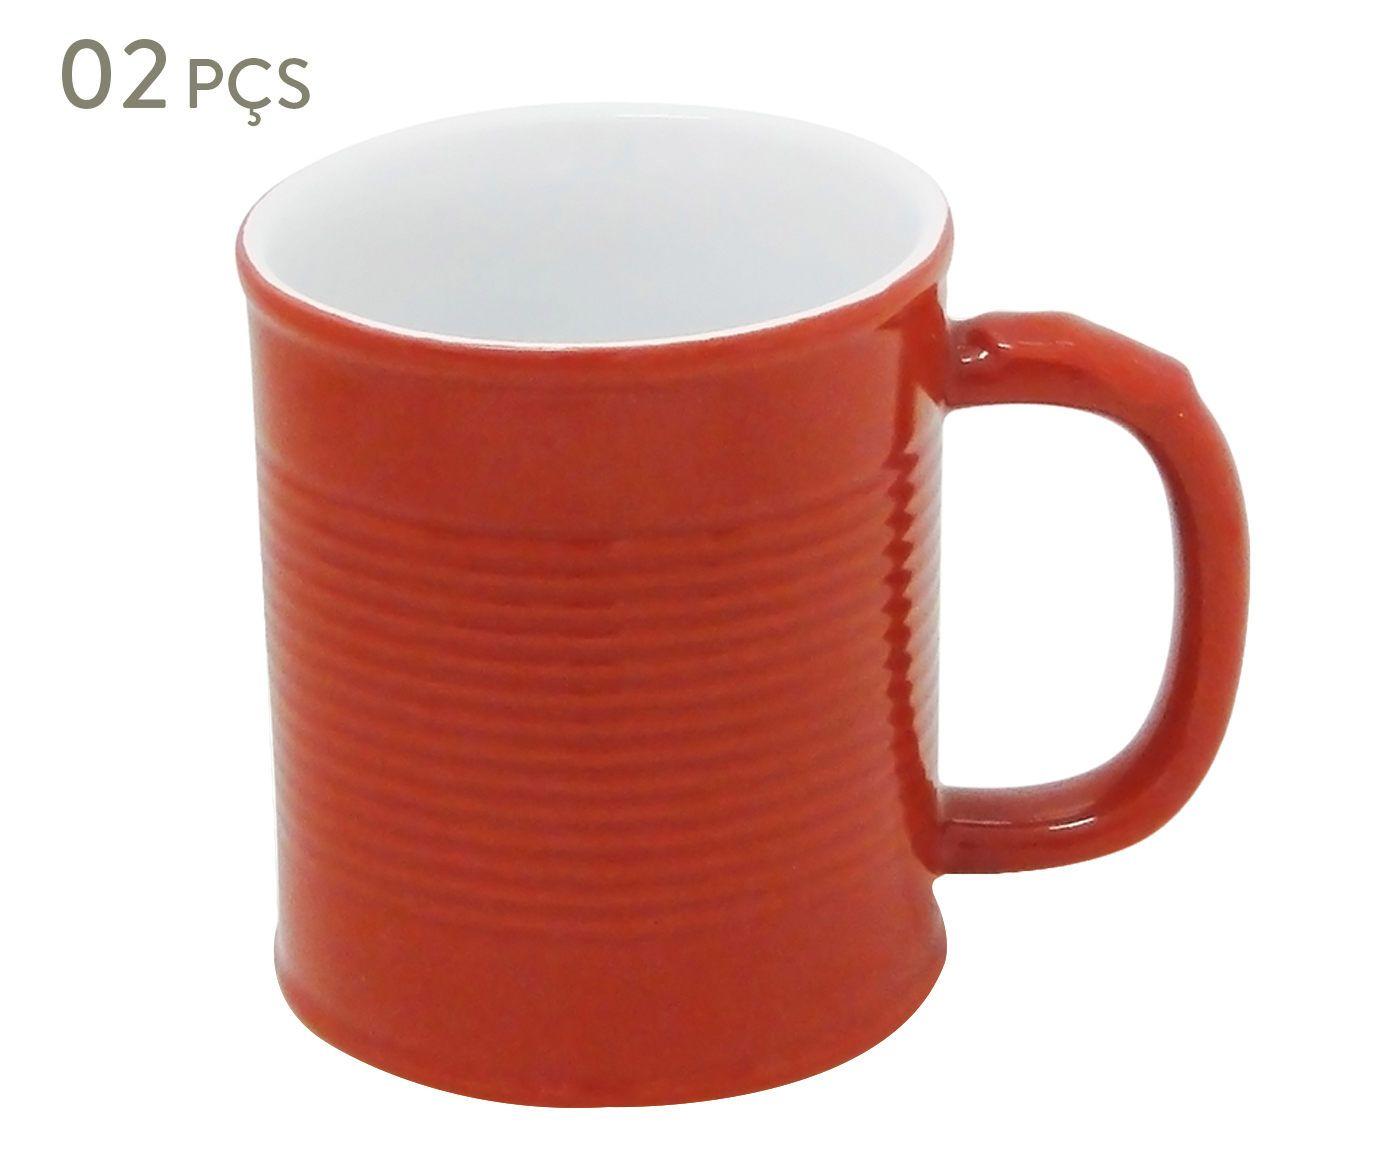 Conjunto de Canecas Espalier rouge - 250 ml | Westwing.com.br